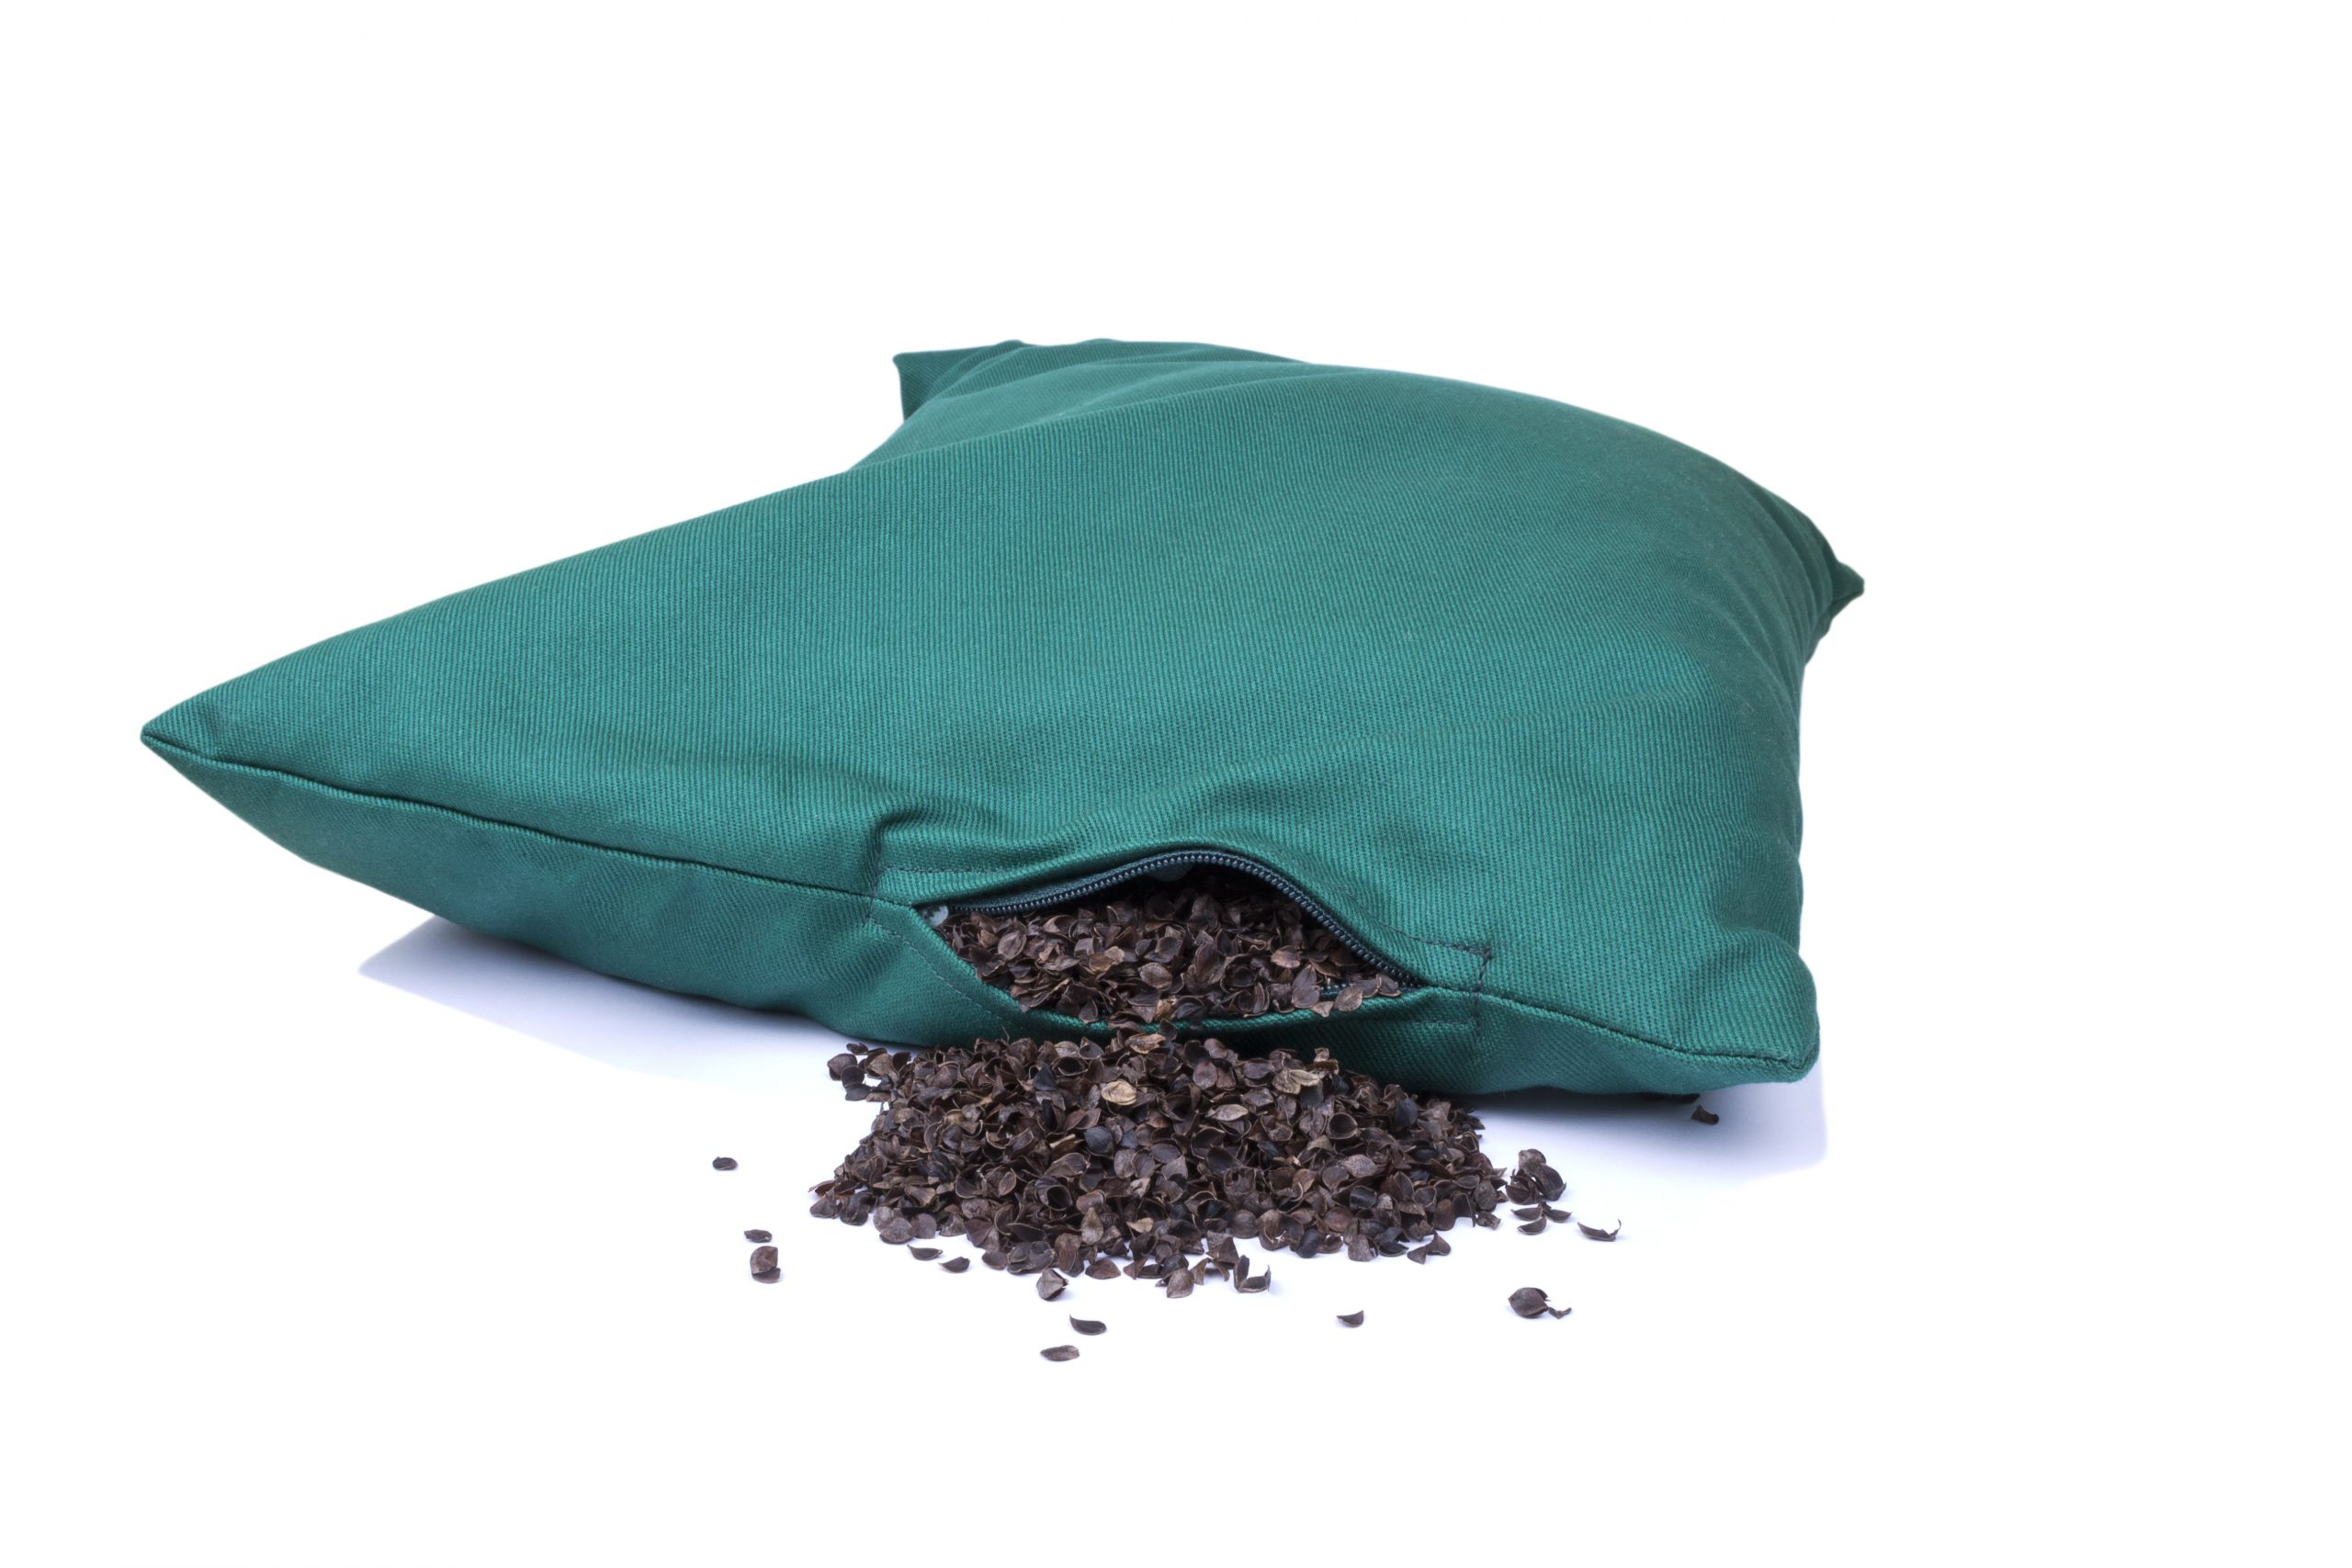 pillow with organic buckwheat hulls